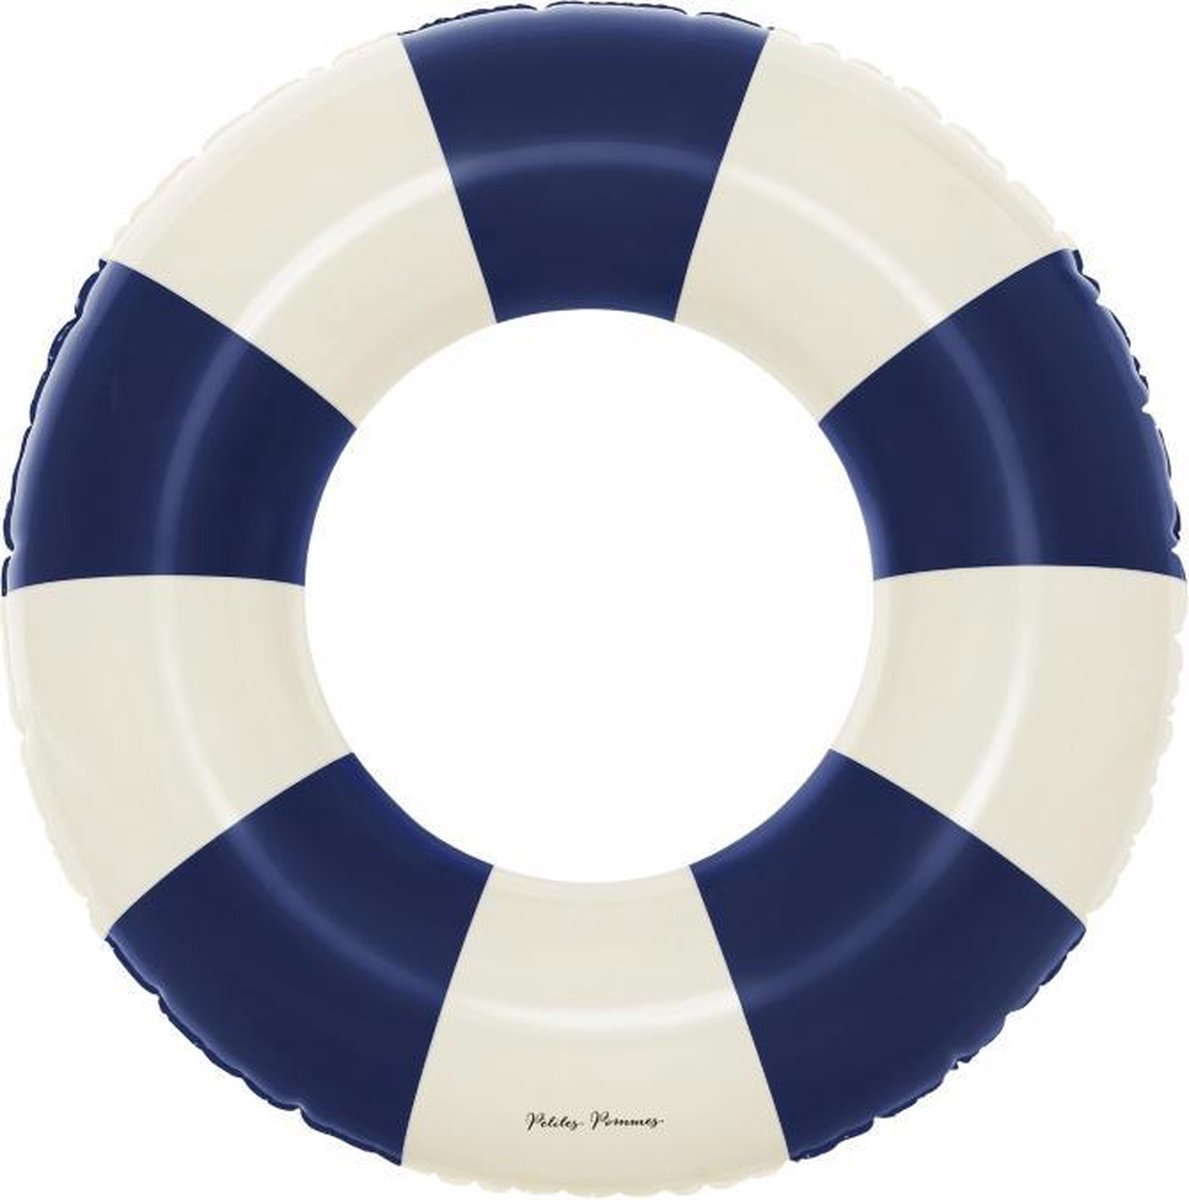 Petites Pommes Zwemring Olivia Cannes Blue - Zwemband - 45 cm - 1 tot 3 jaar